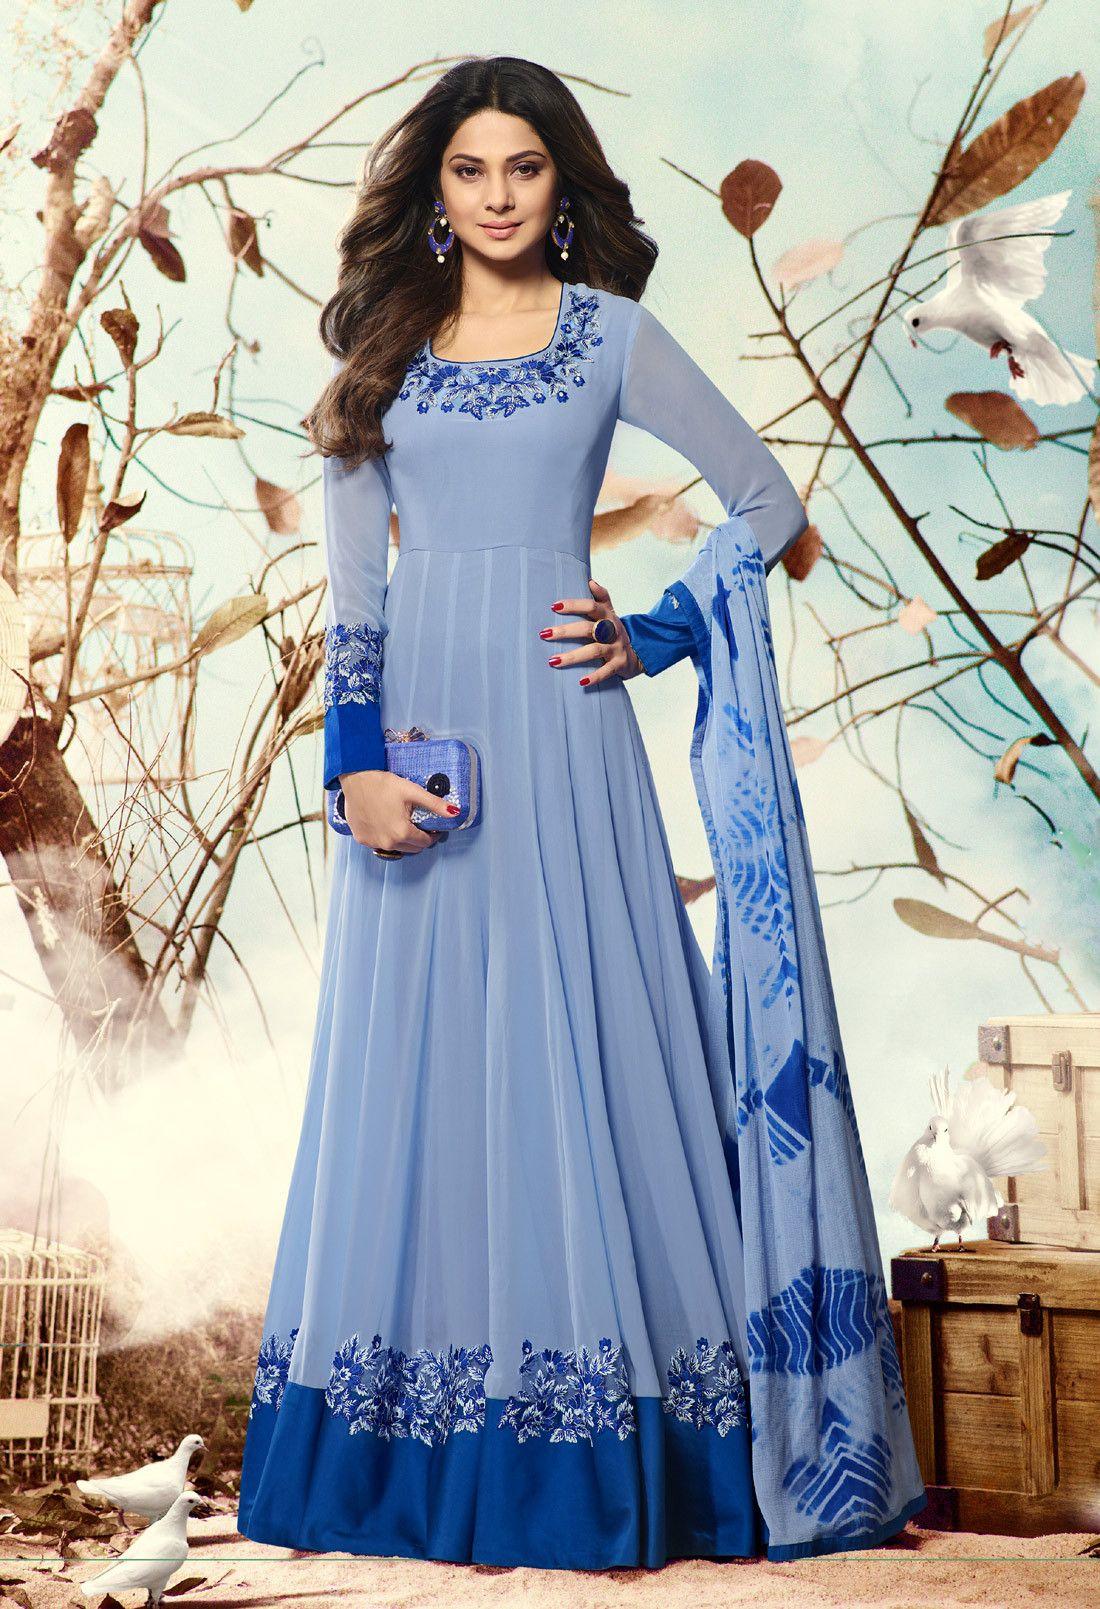 jennifer winget floor length dress | Designer dresses ...